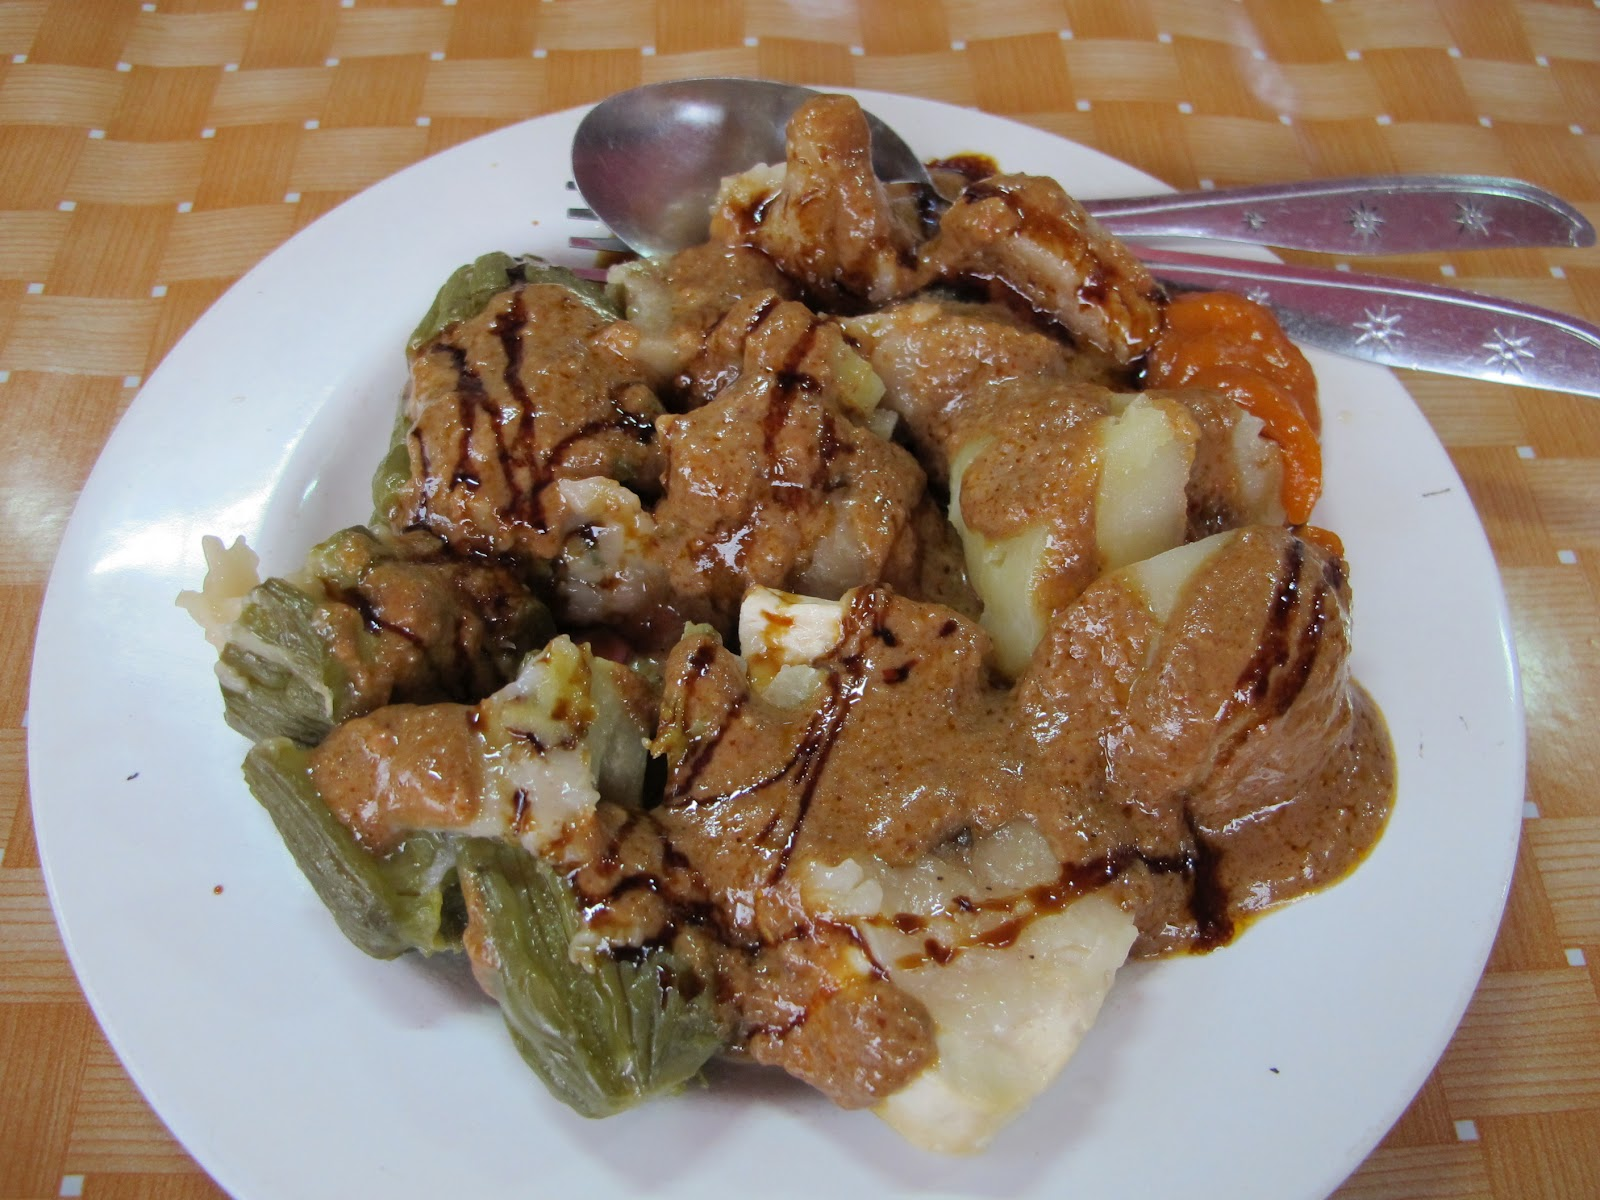 Resep Cara Membuat Siomay Bandung Daging Ikan Tenggiri atau ayam